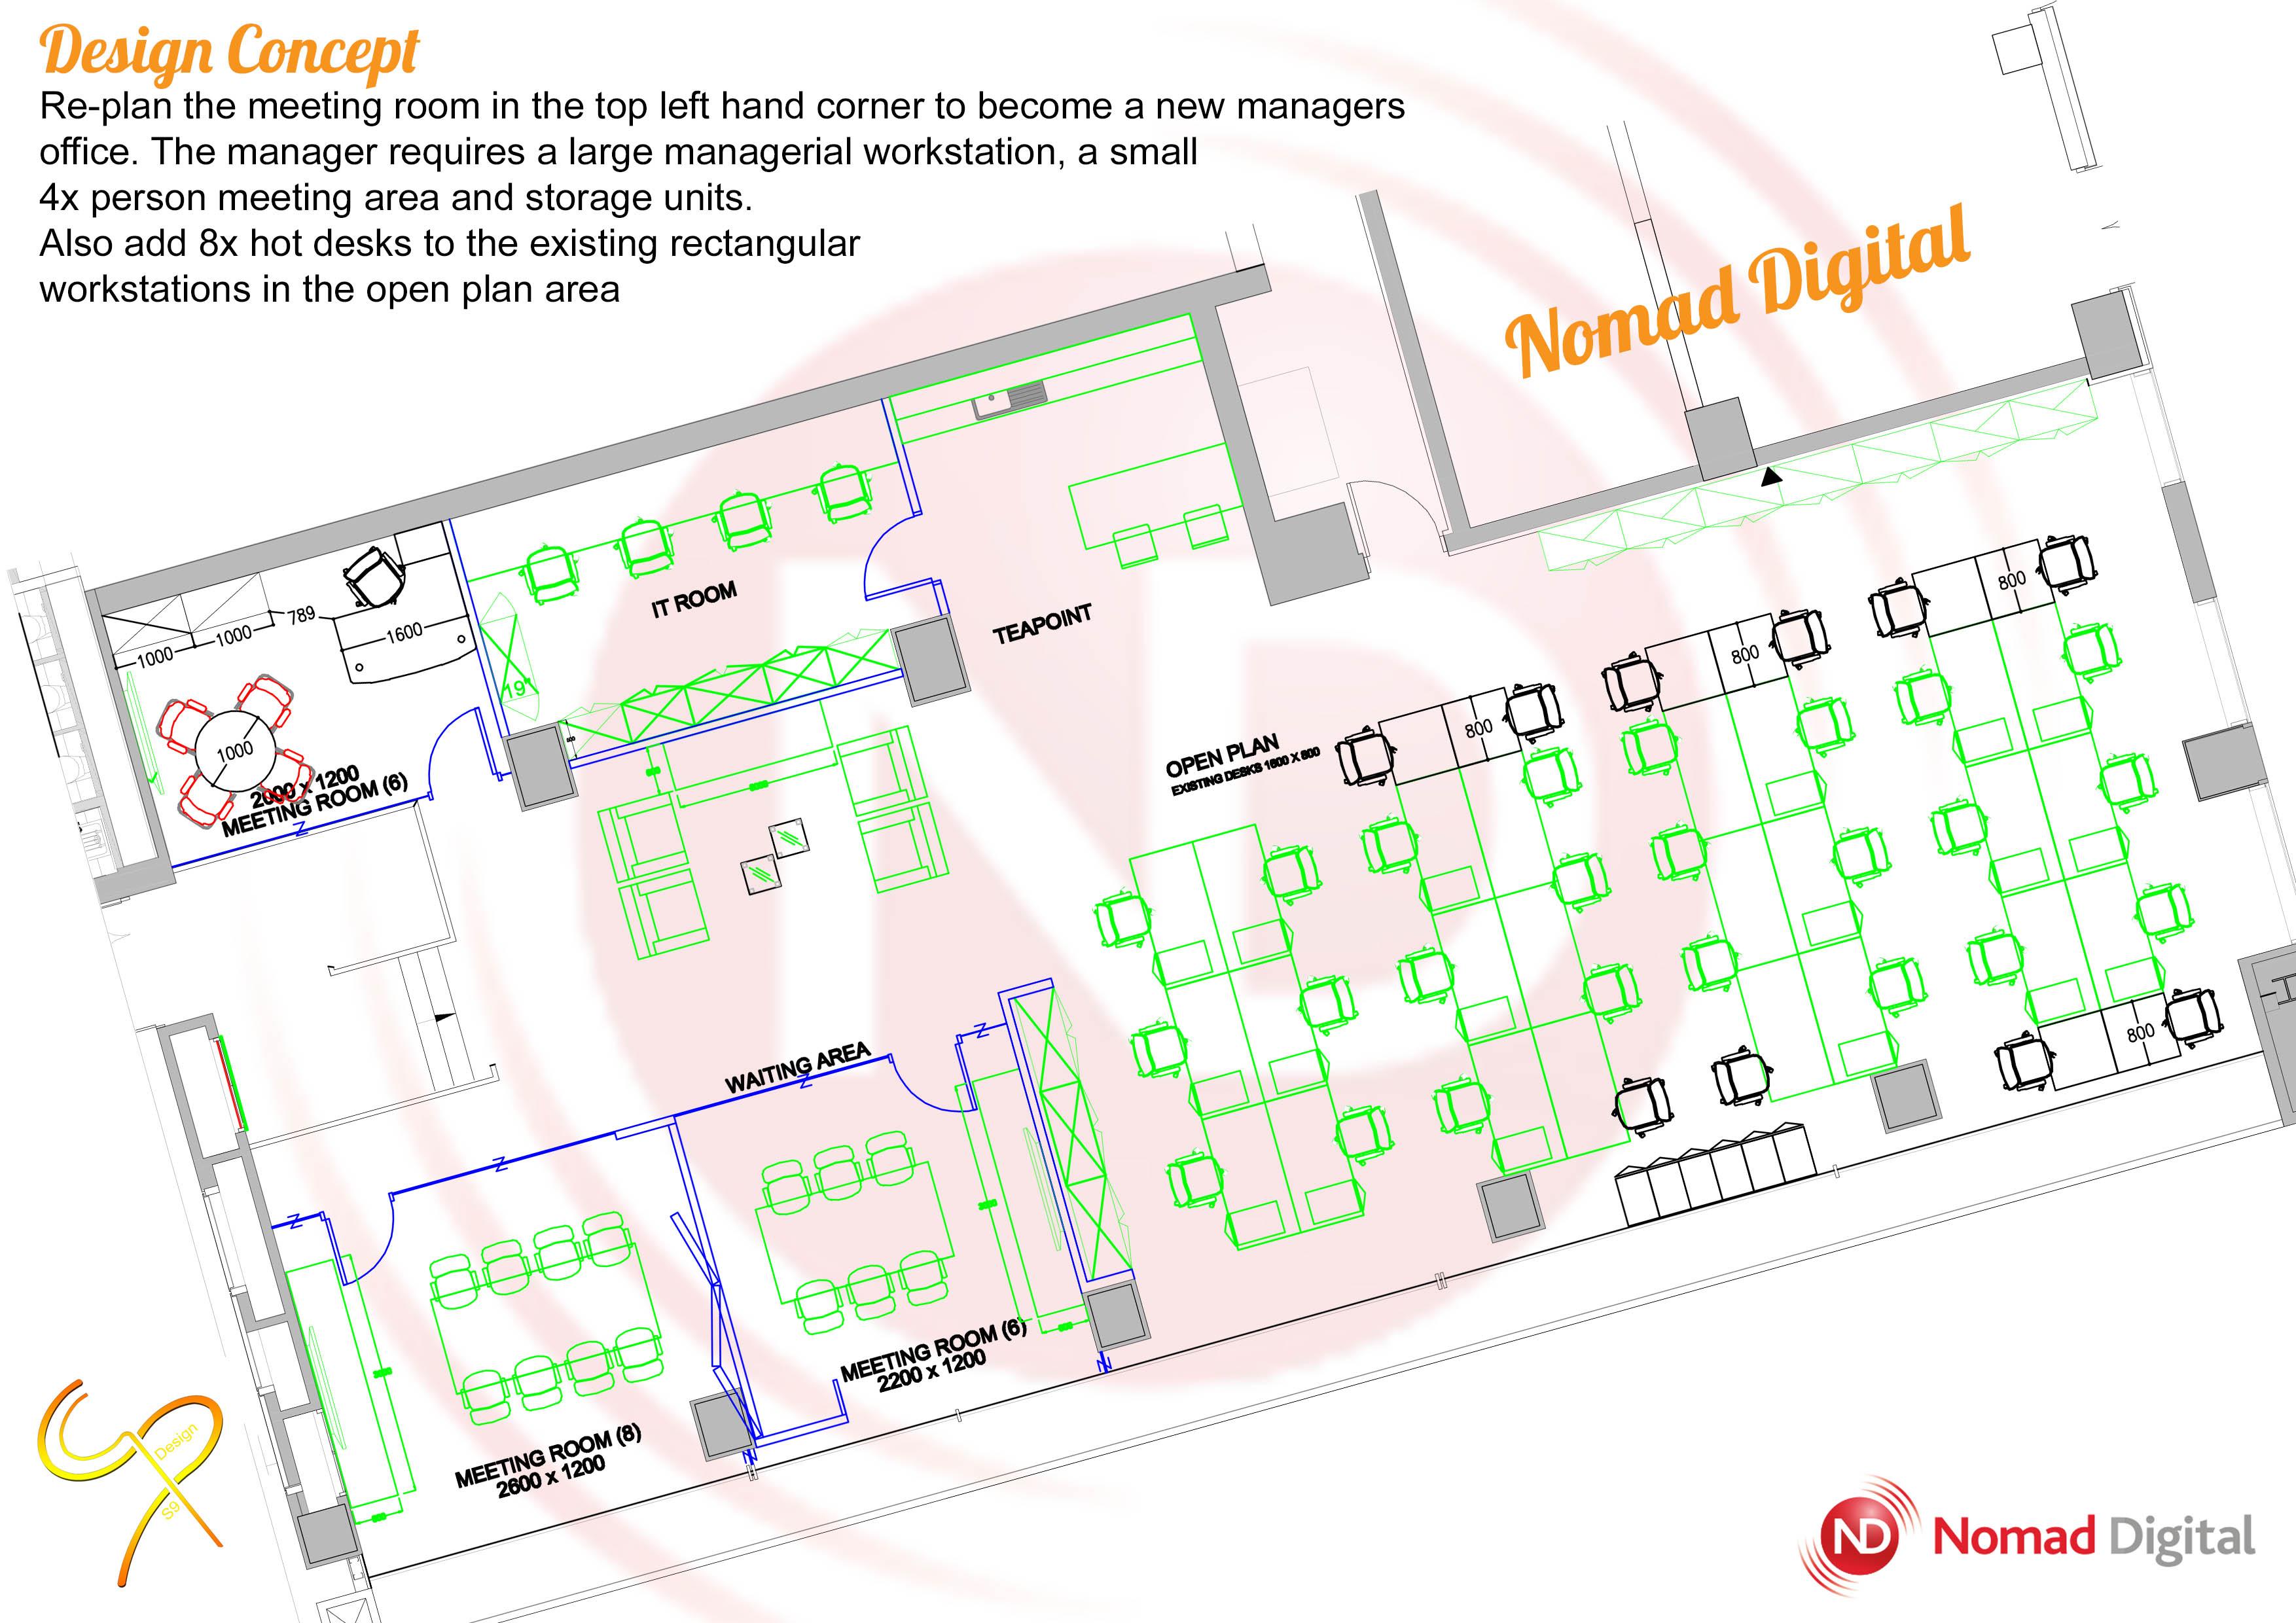 Nomad Digital - Ground Floor